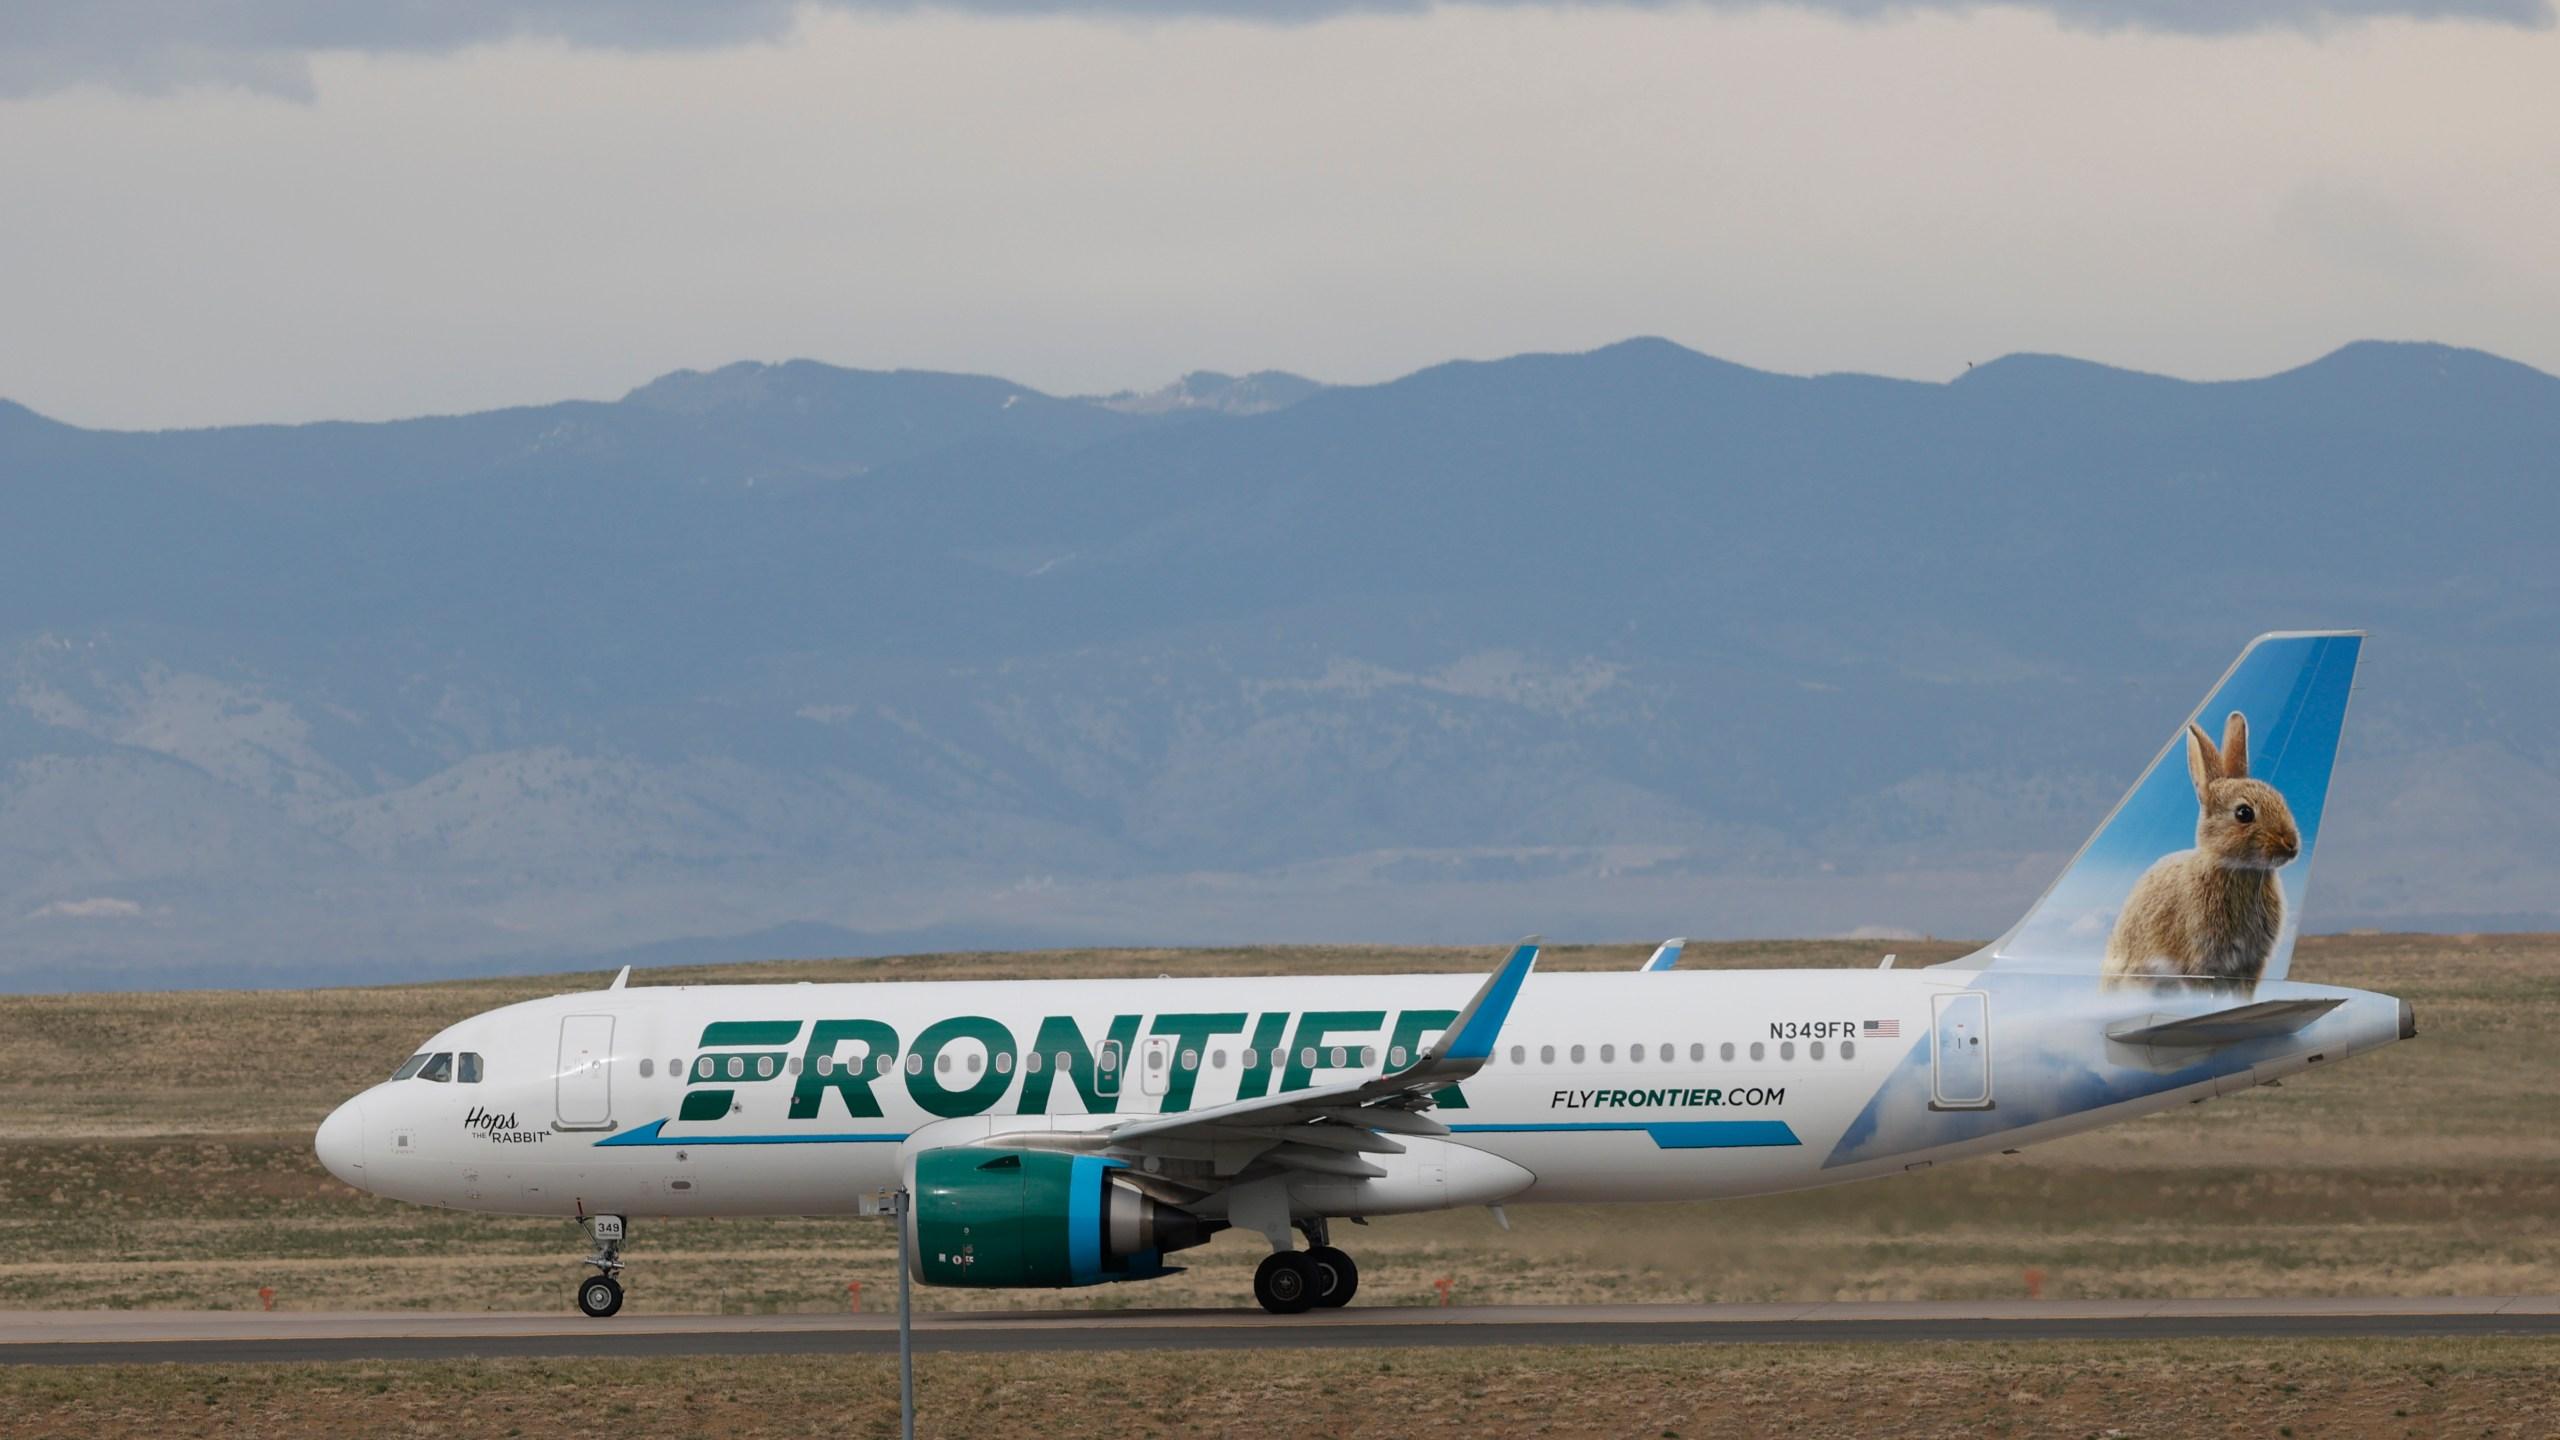 Denver International Airport, Frontier